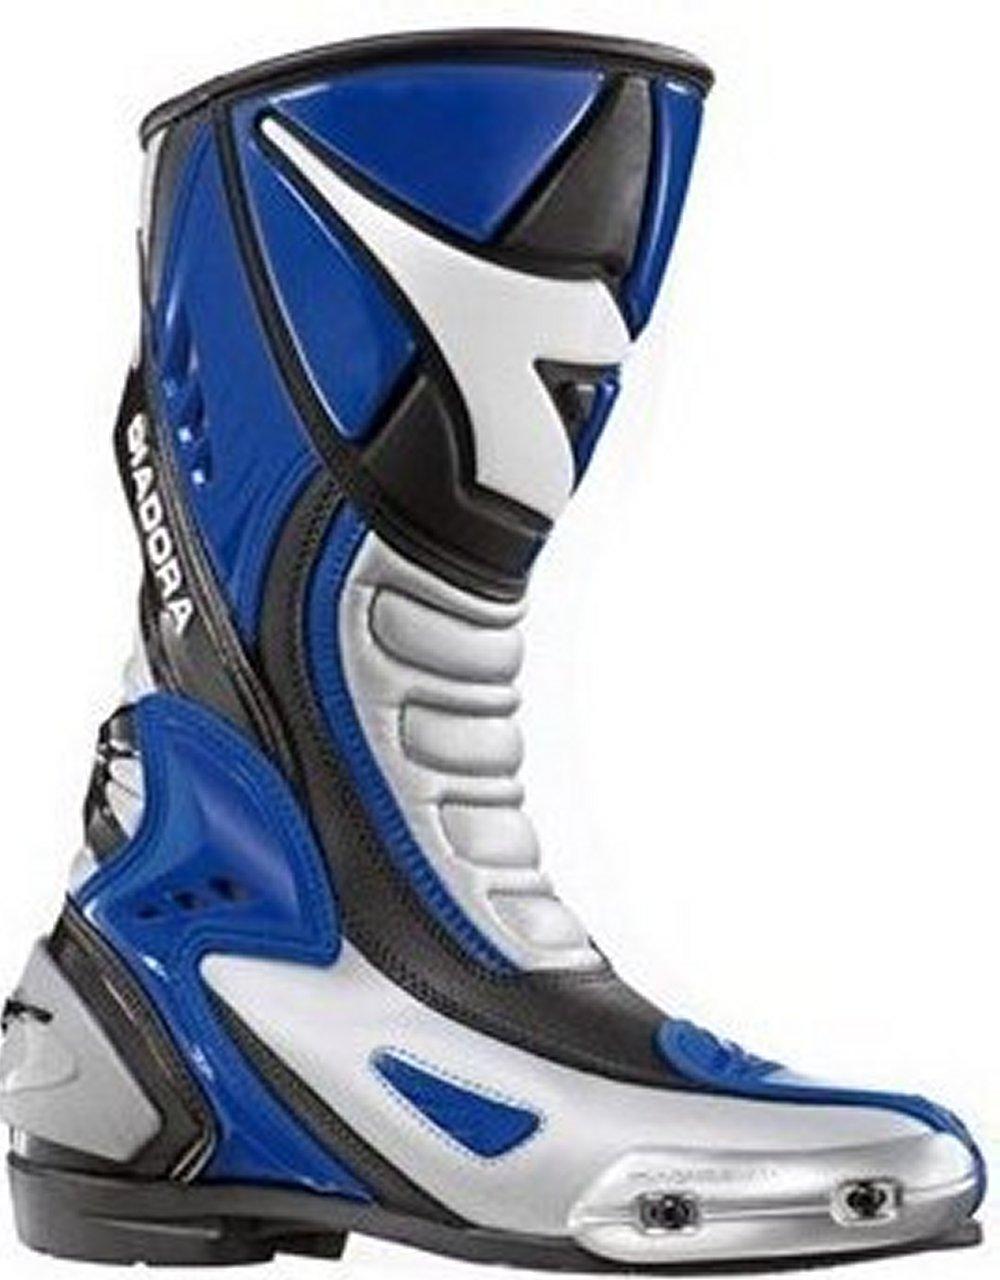 : Diadora Aigle FX Bottes de moto moto bottes J & S